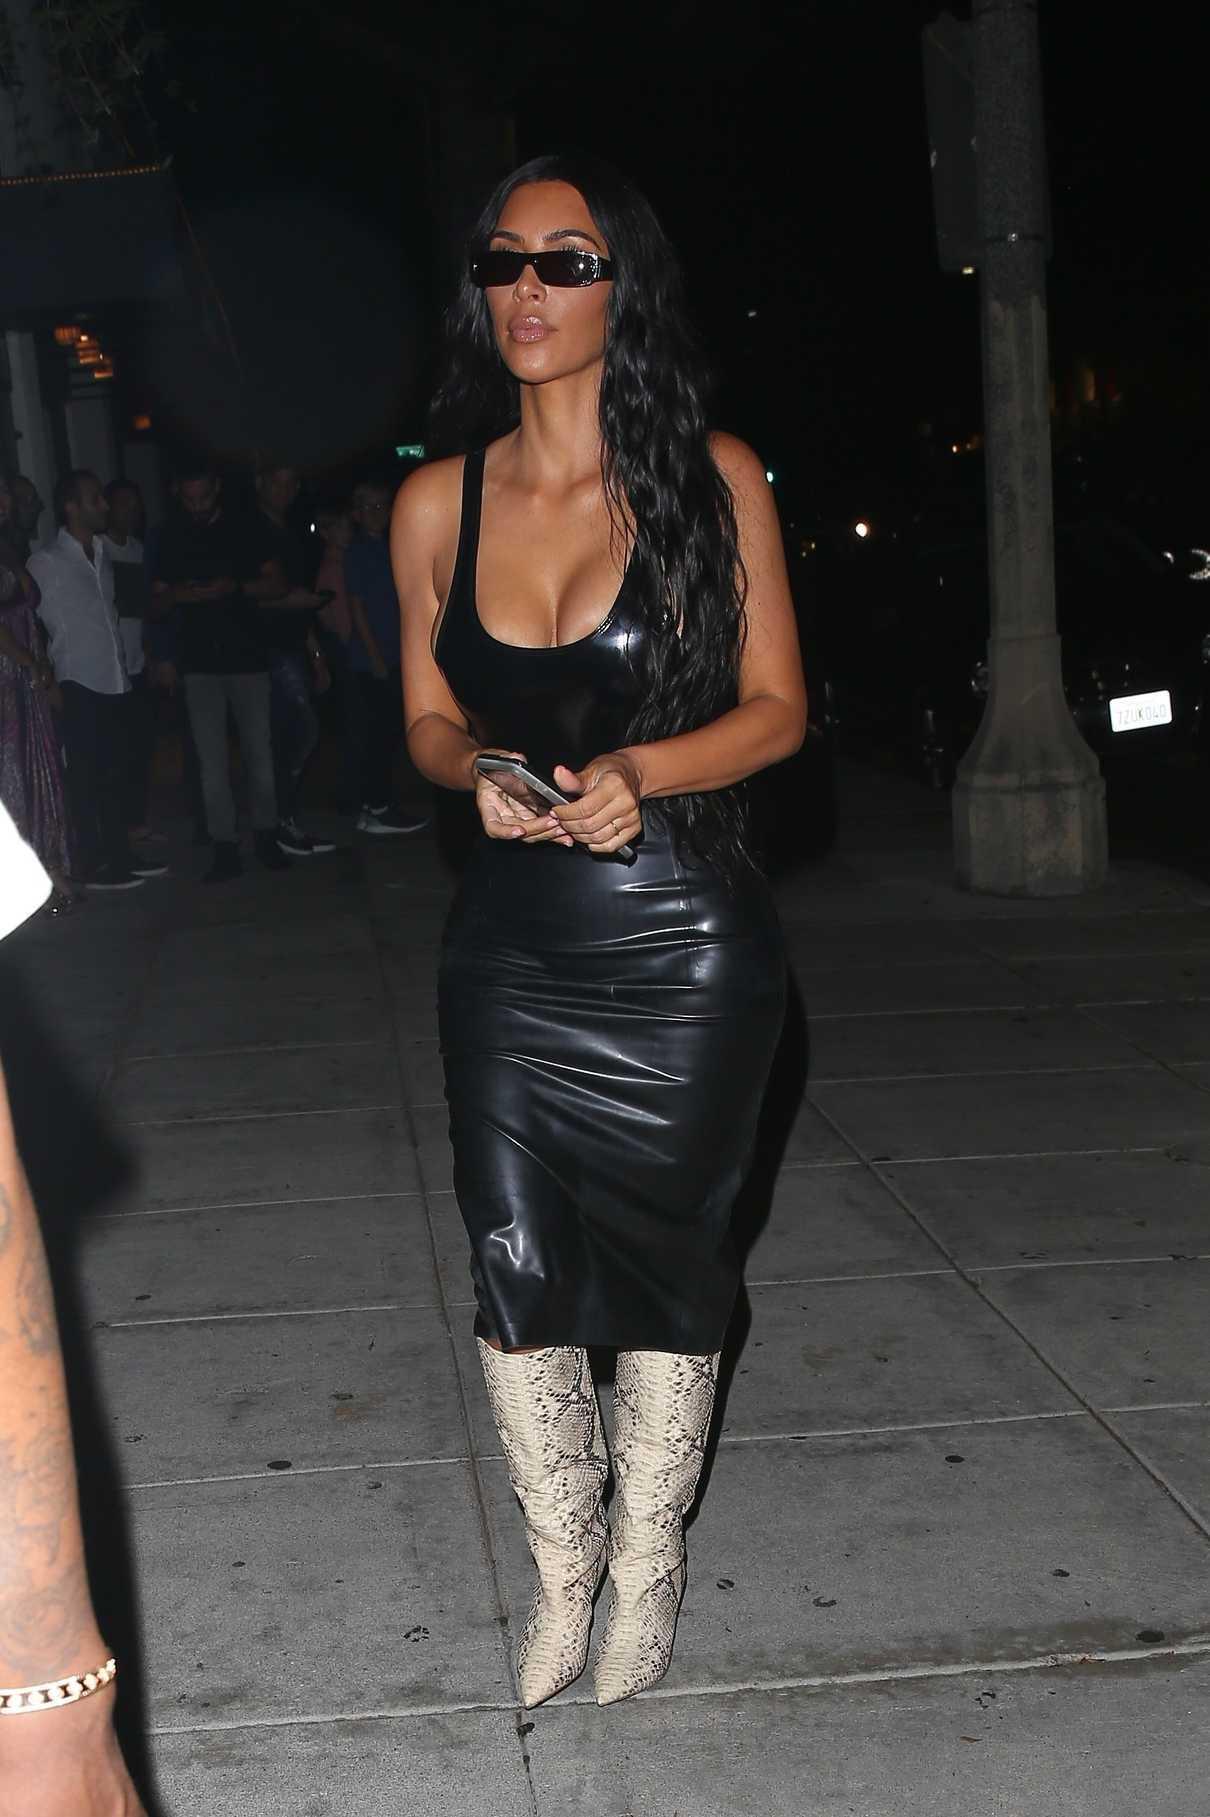 Kim Kardashian in a Black Leather Skirt